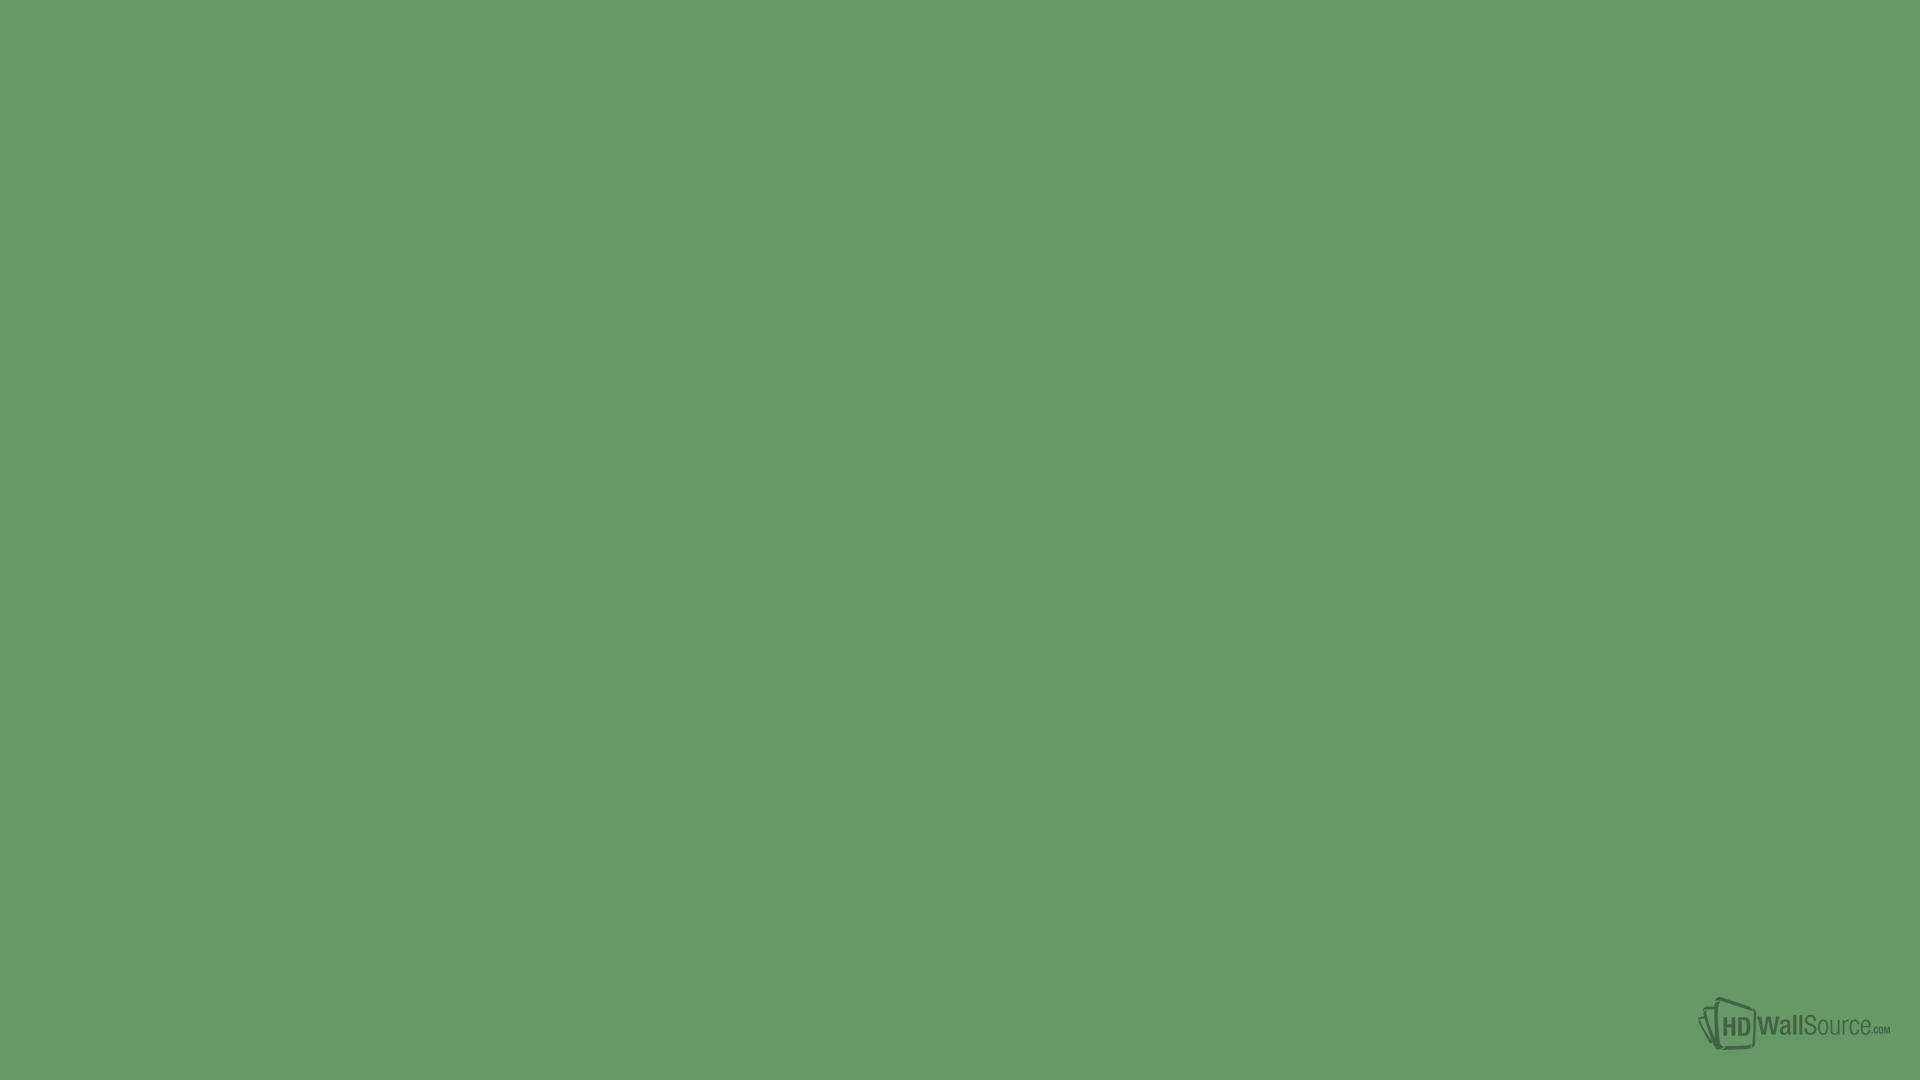 669966 wallpaper 71076